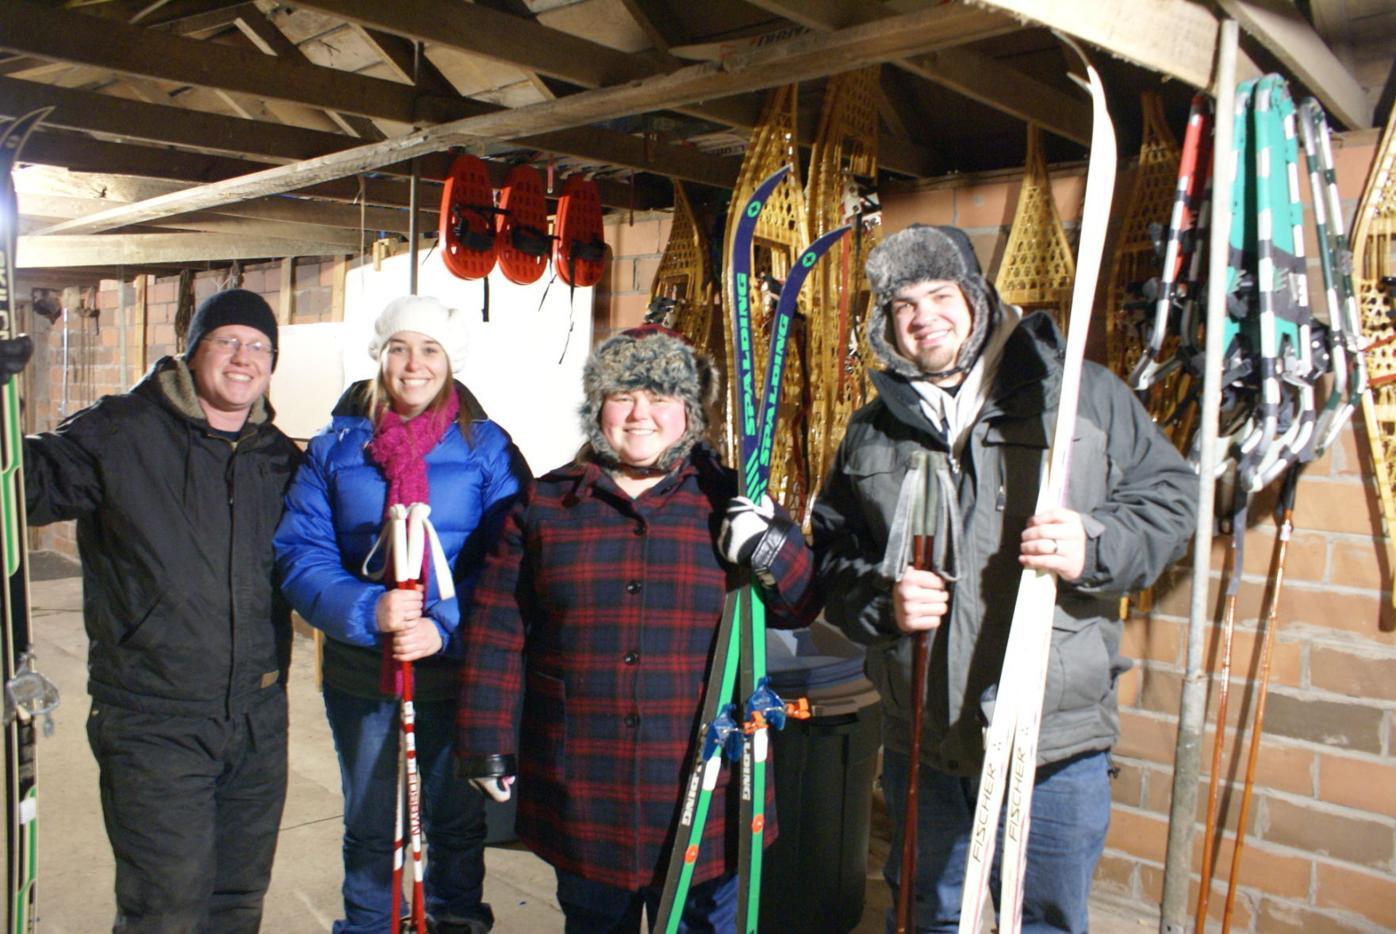 Visitors warmed during Candlelight Ski at Ney Nature Center despite bitter cold